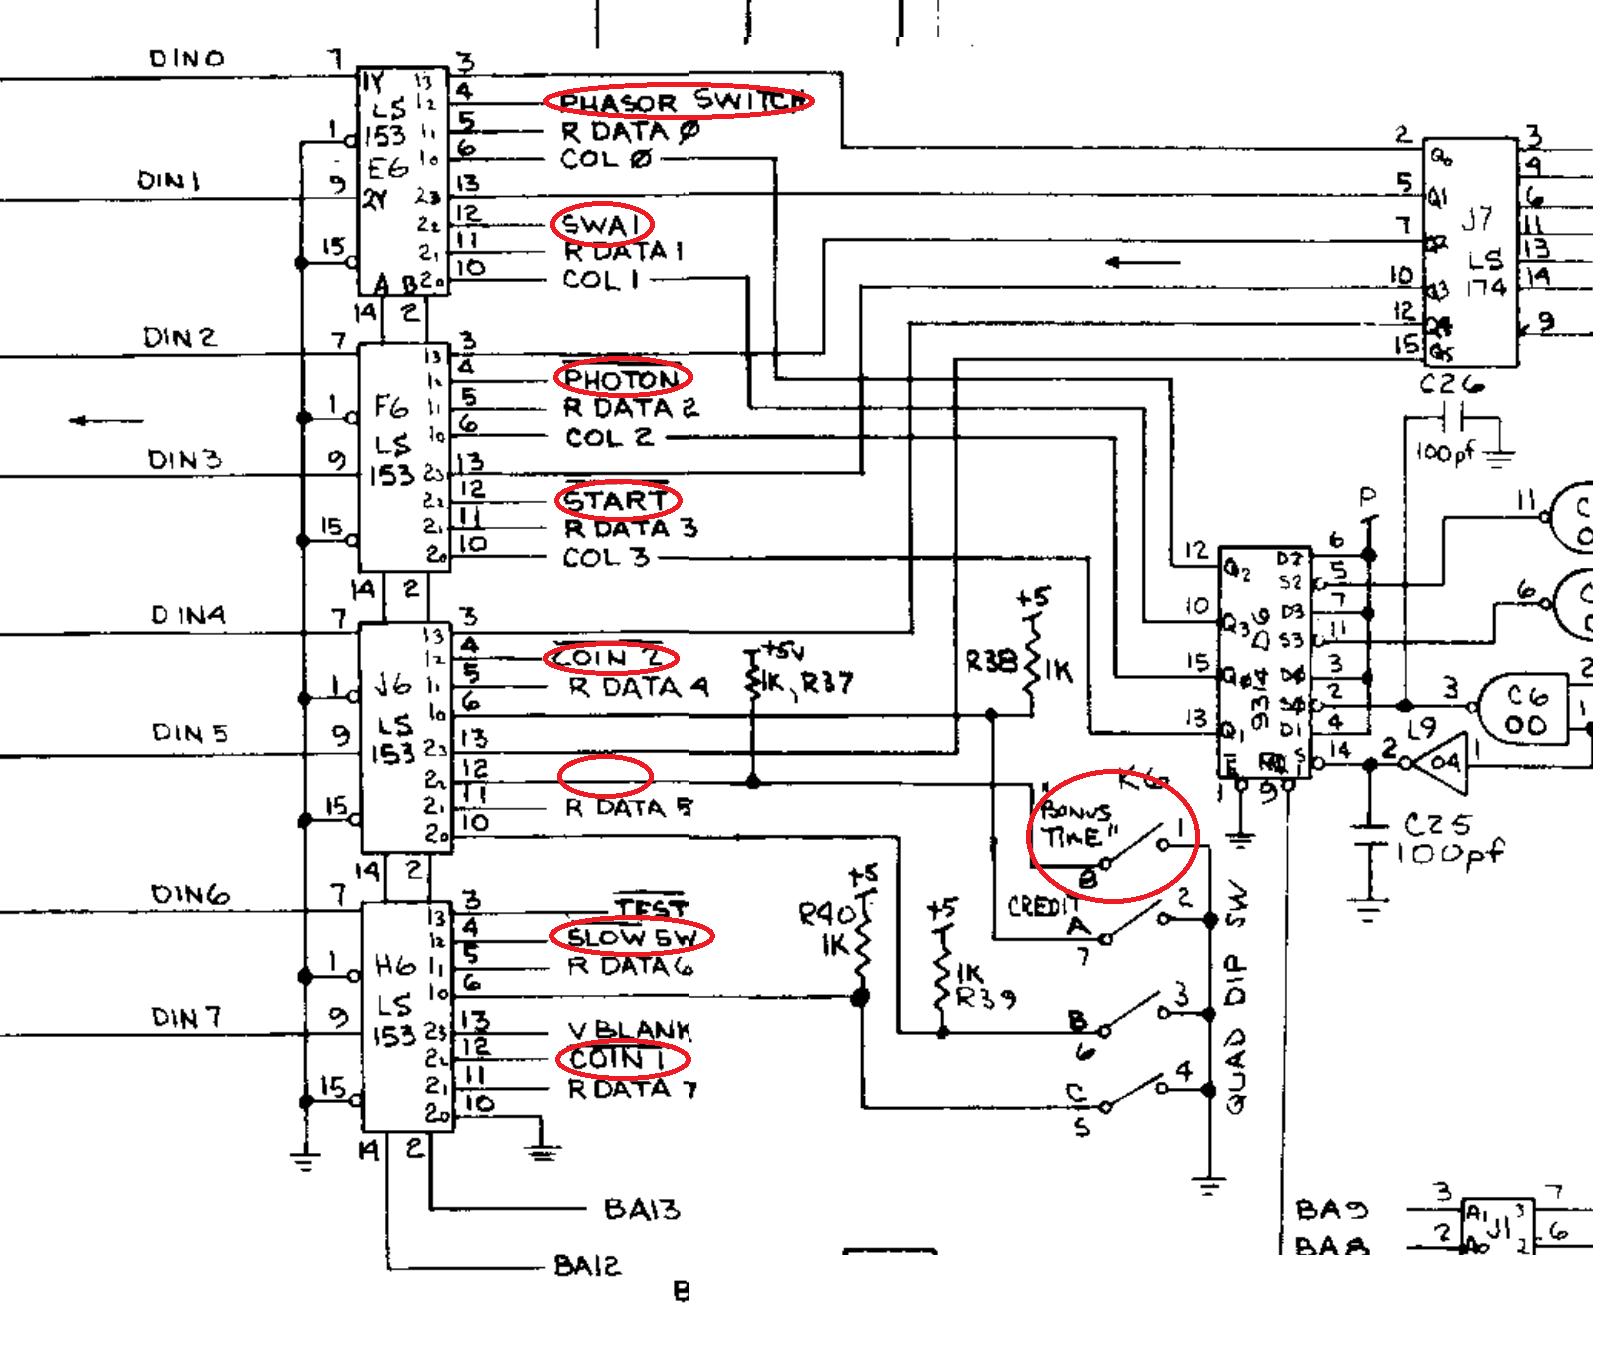 hight resolution of llv wiring diagram 88 box wiring diagram suburban wiring diagram llv wiring diagram 88